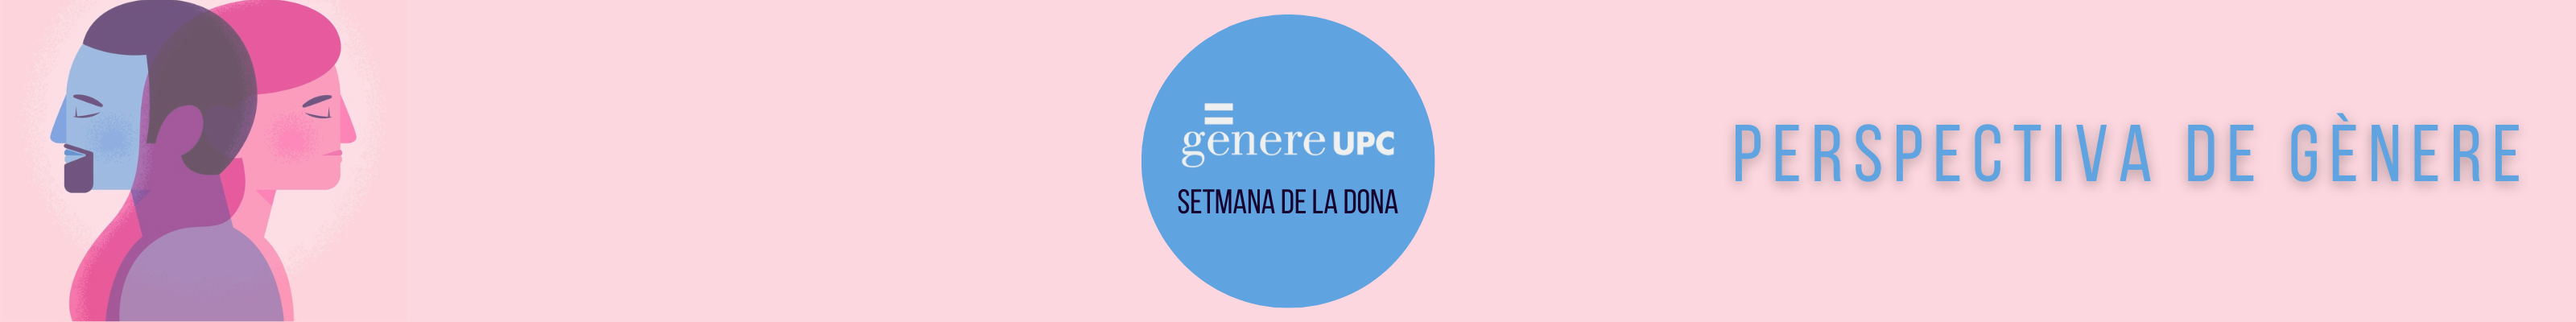 setmana-dona_perspectiva-genere.png